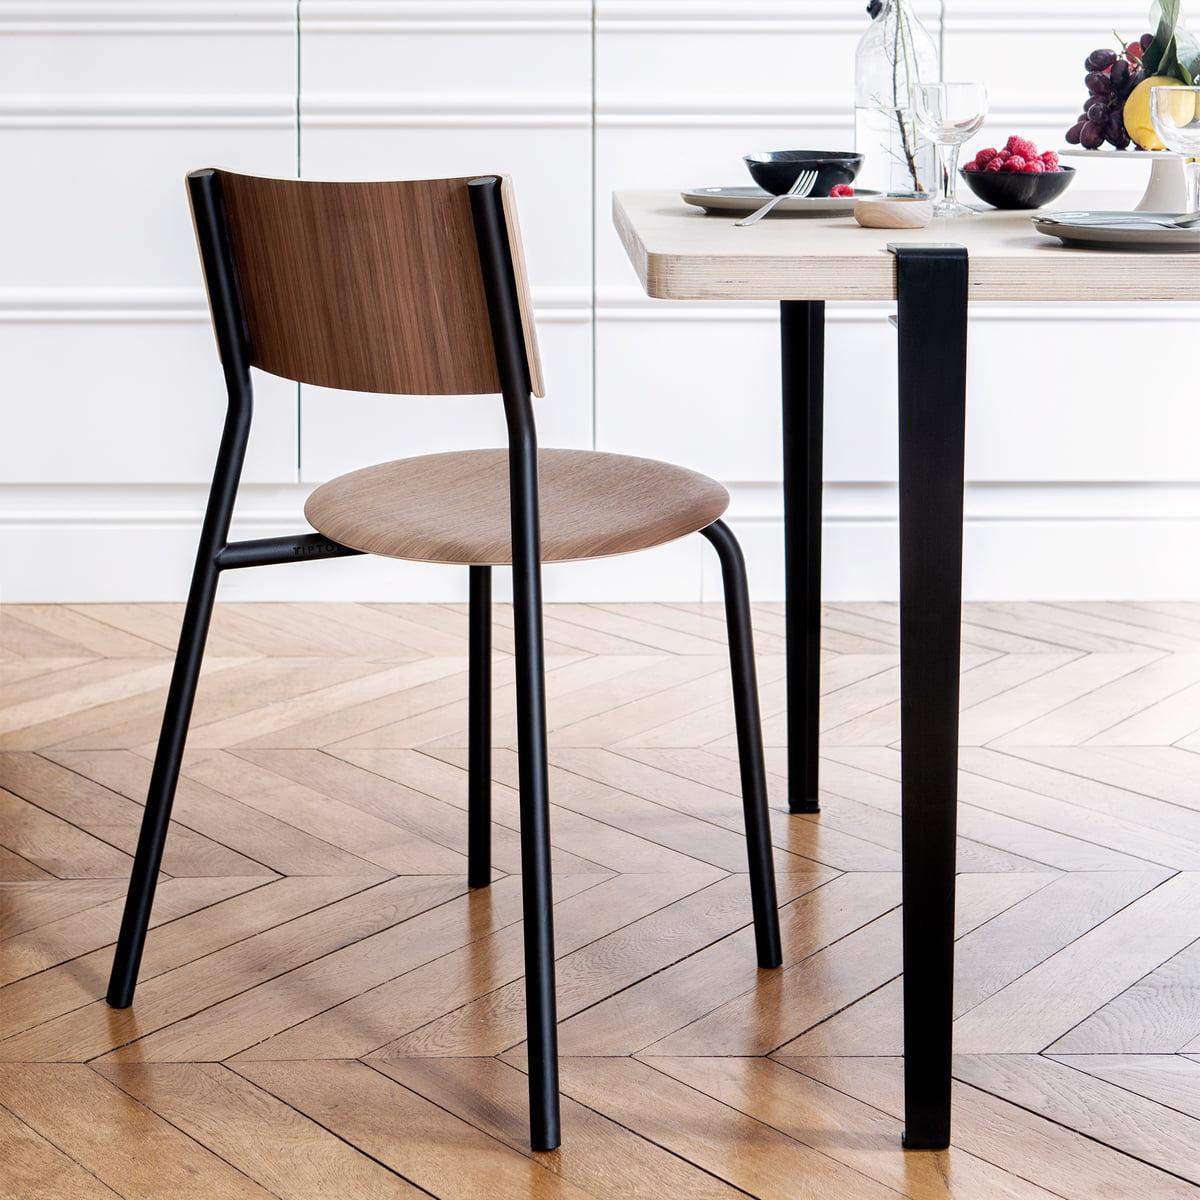 Chair Alurahmen 40x40 cm stahl